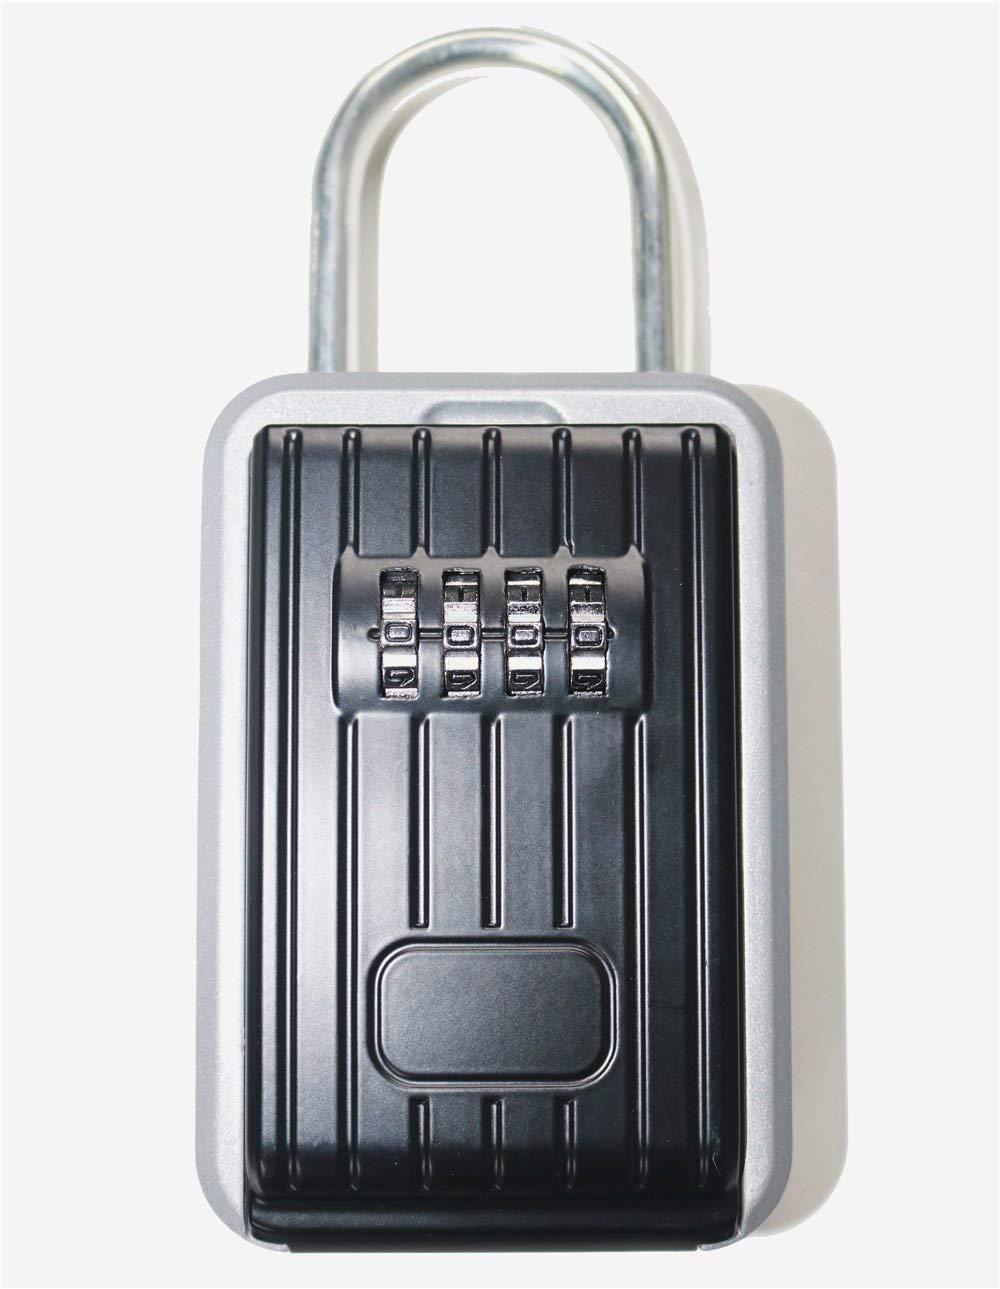 dba2a3d2398d Cheap House Key Lock Box, find House Key Lock Box deals on line at ...